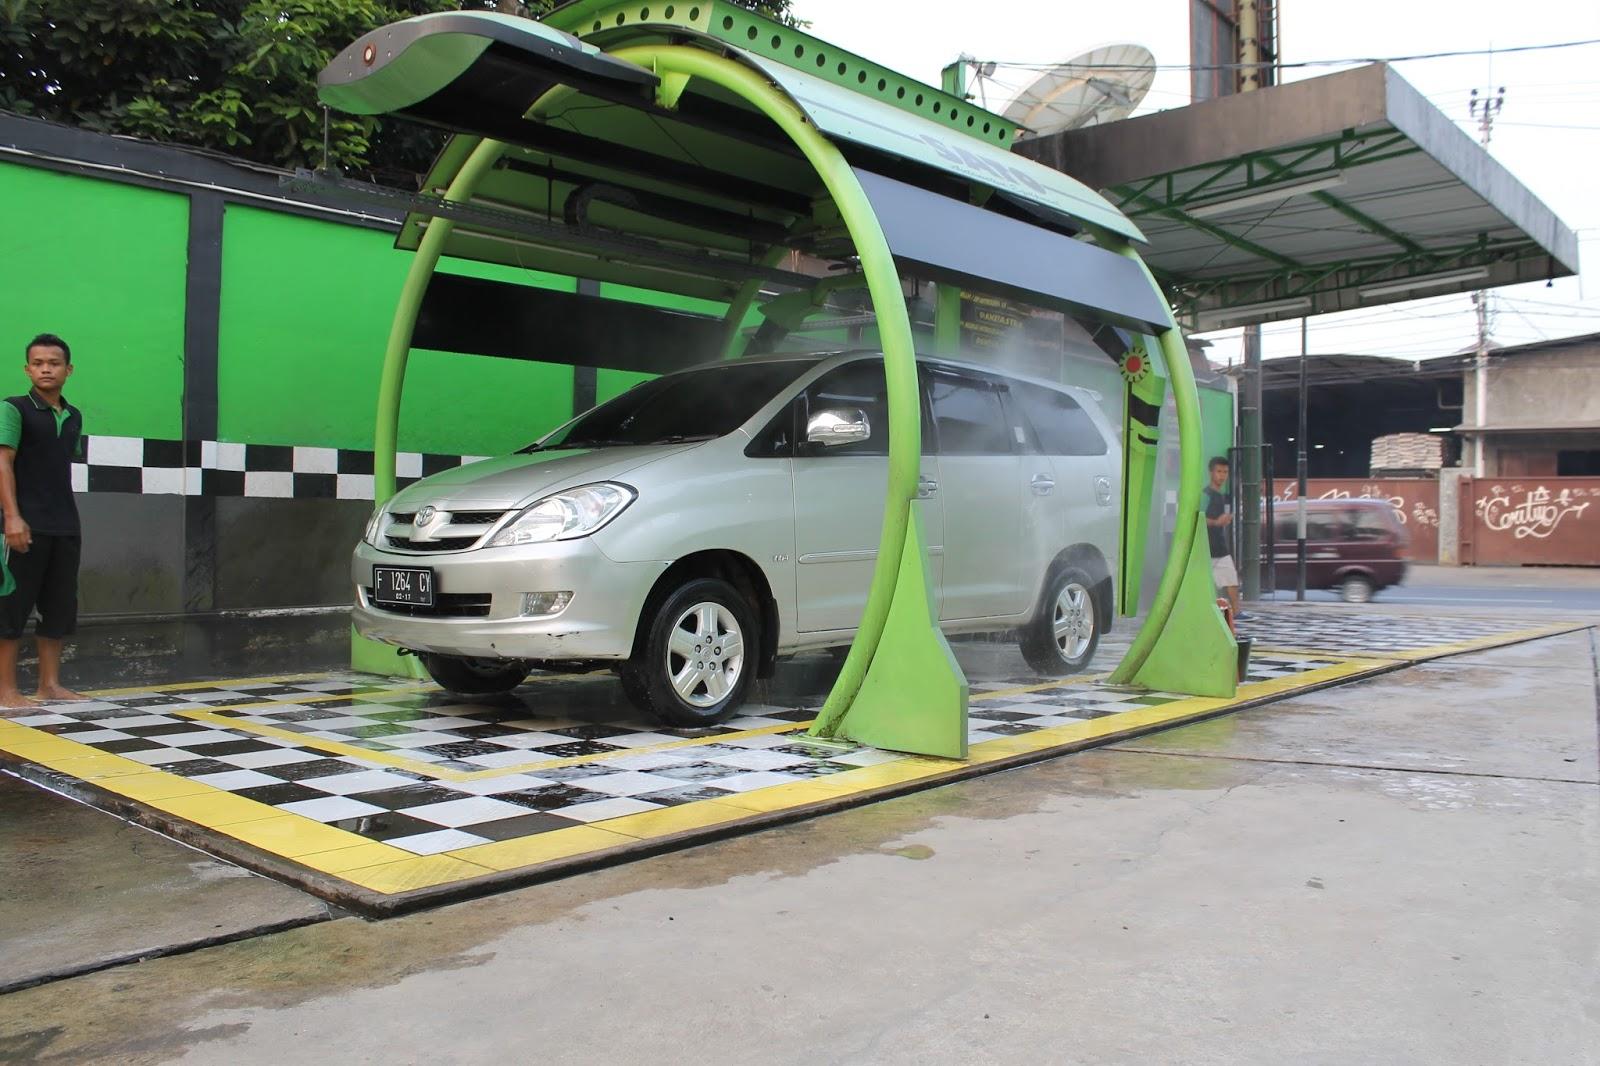 Cuci Mobil Robotik Pertama Di Indonesia Cuci Mobil